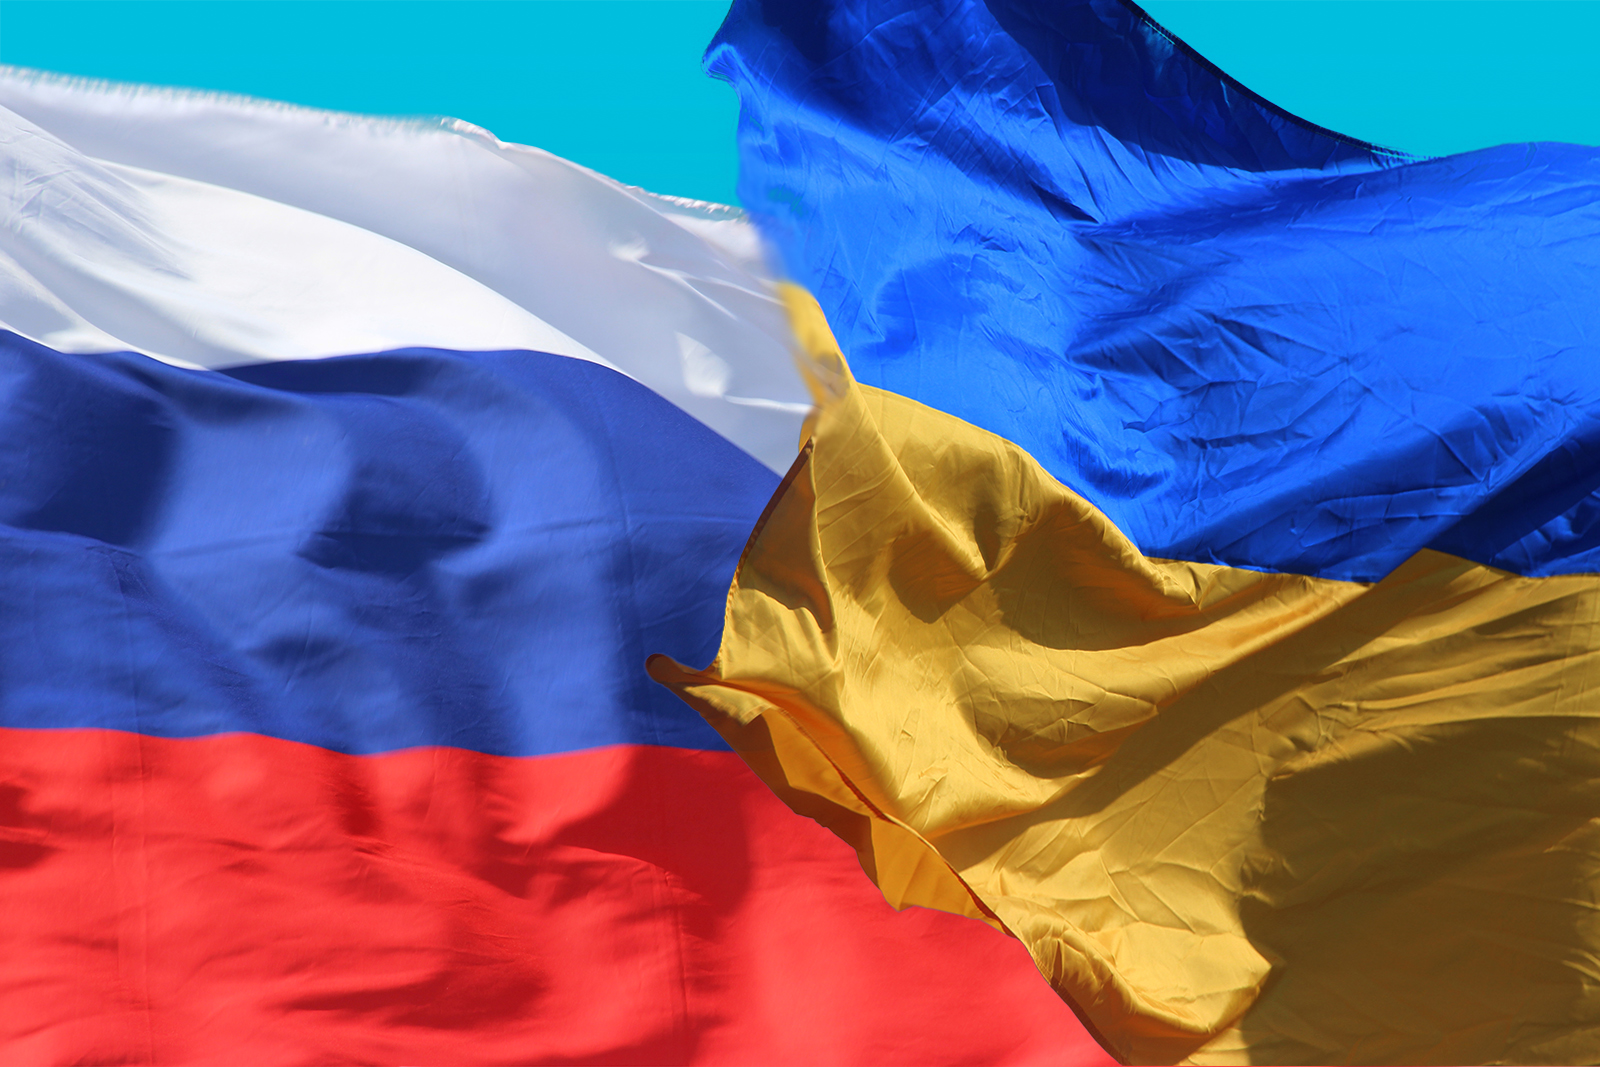 Флаг РФ и Украины